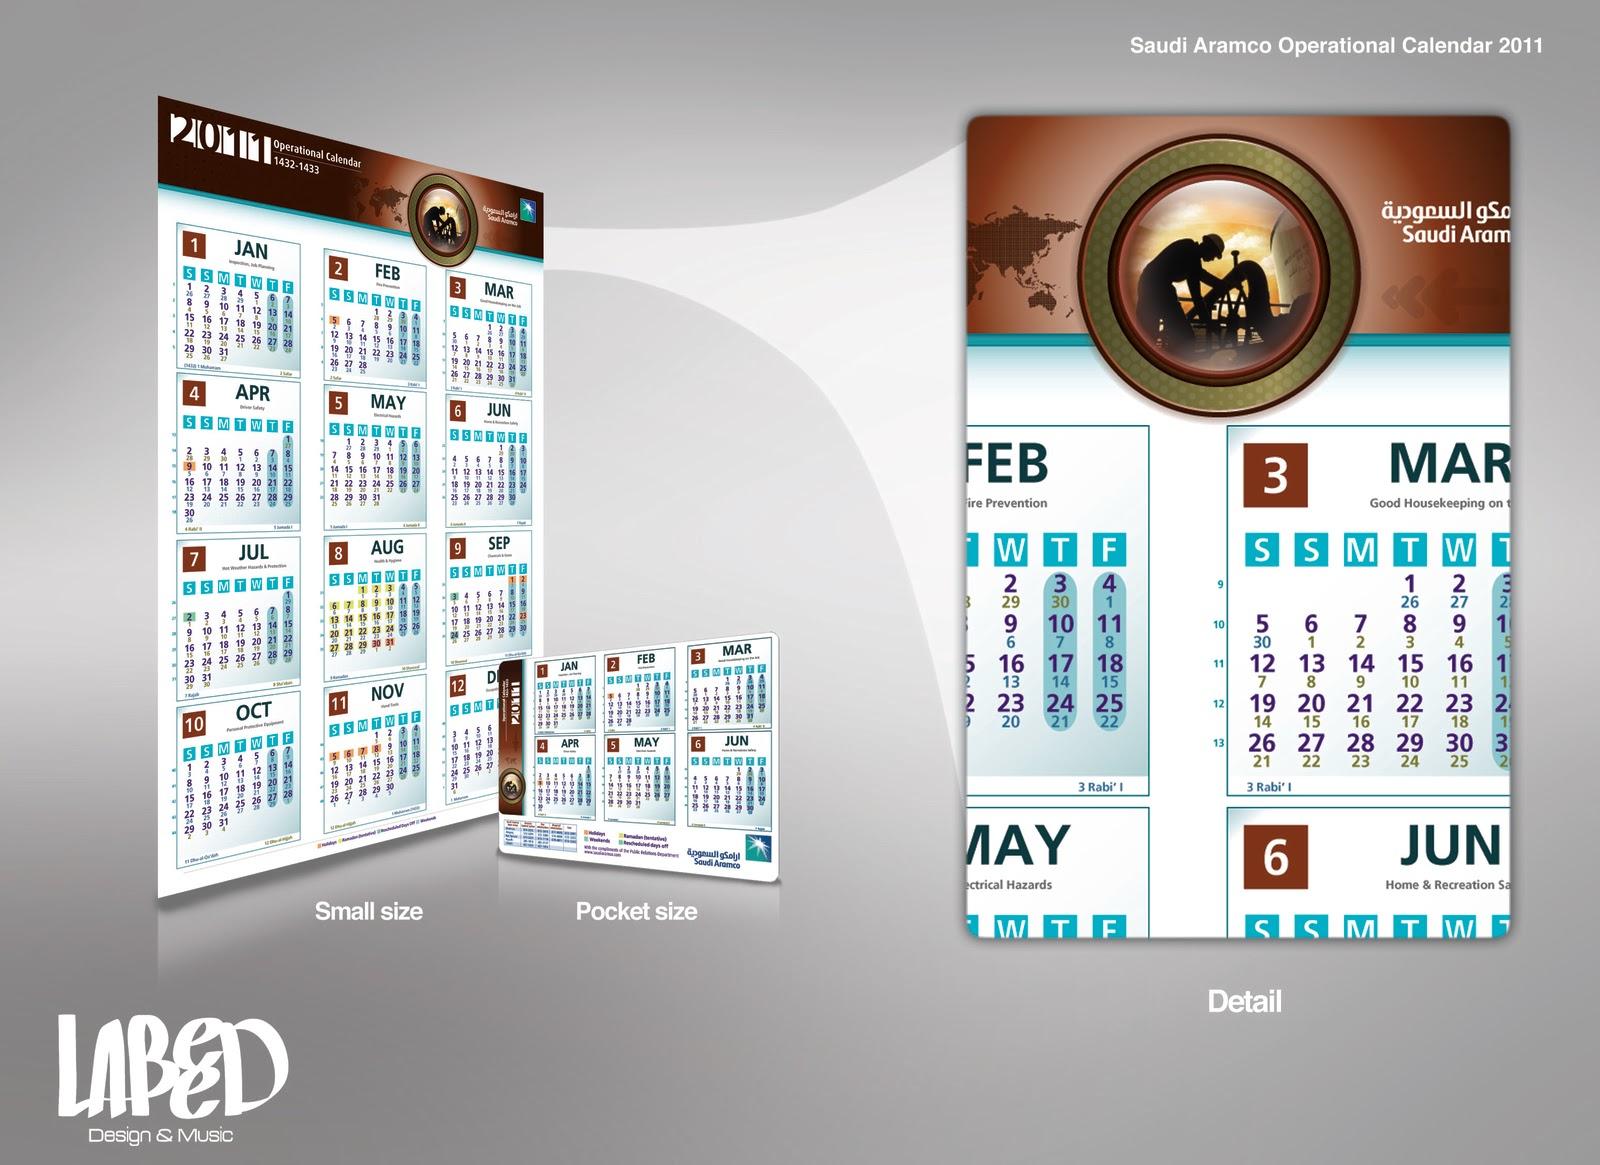 Aramco Calendar 2015 | Search Results | Calendar 2015